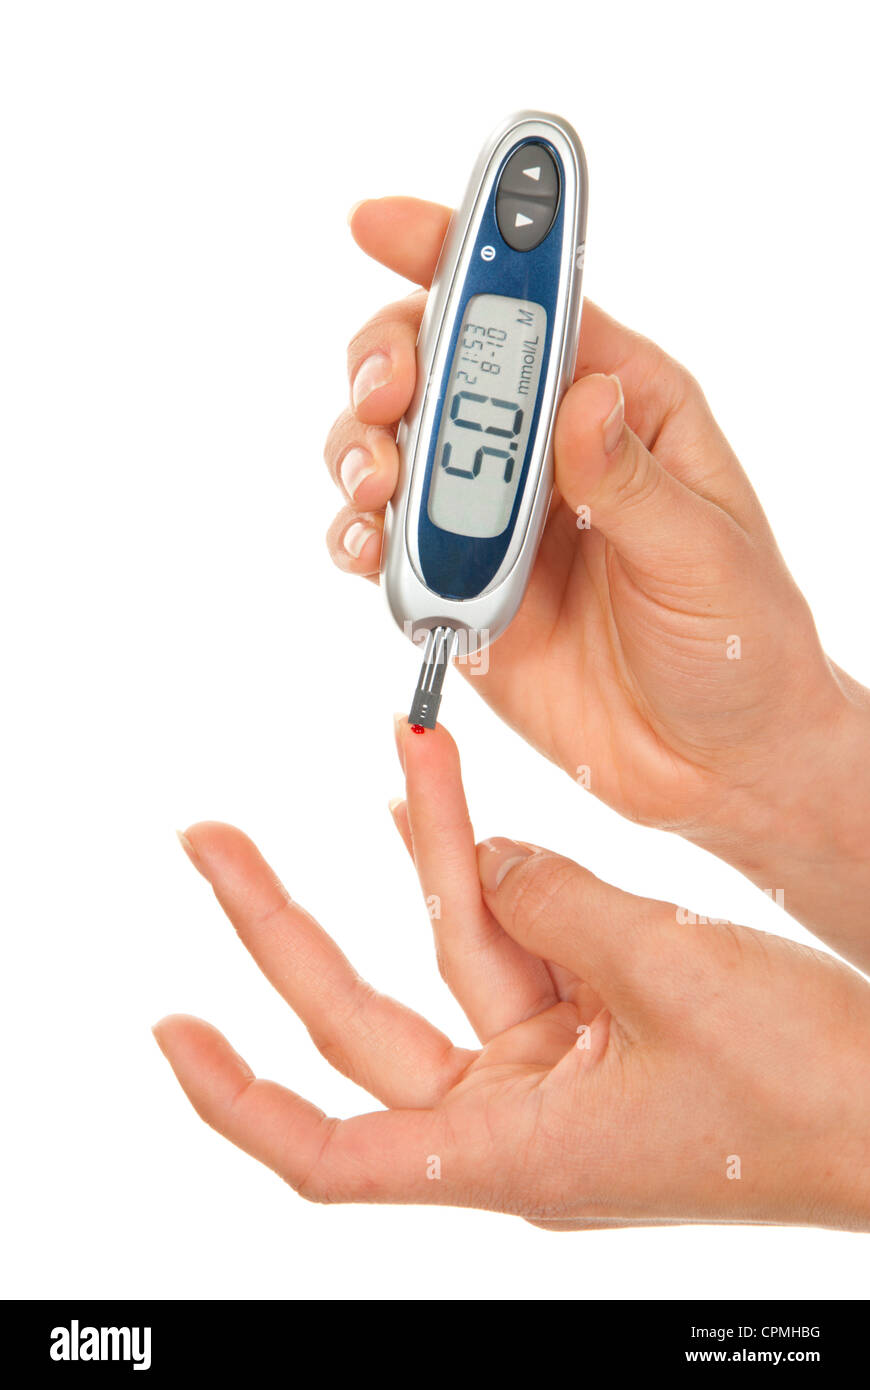 Diabetes patient measuring glucose level blood test - Stock Image